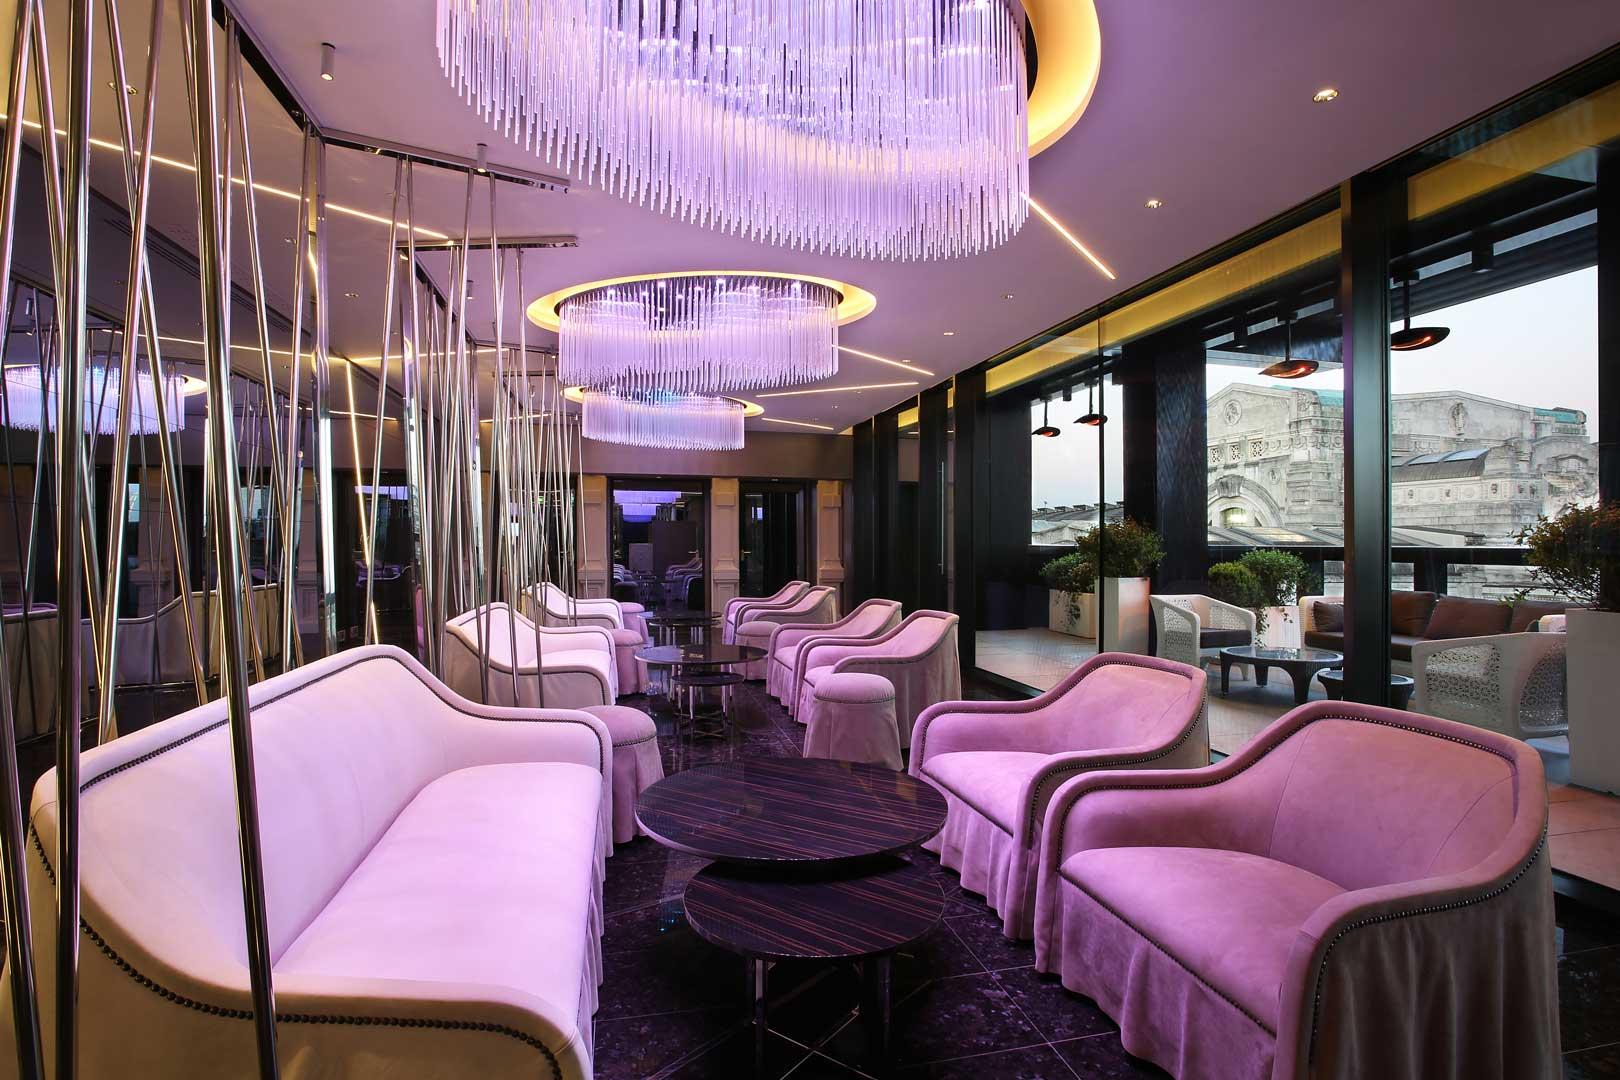 Terrazza Gallia | Flawless Milano - The Lifestyle Guide